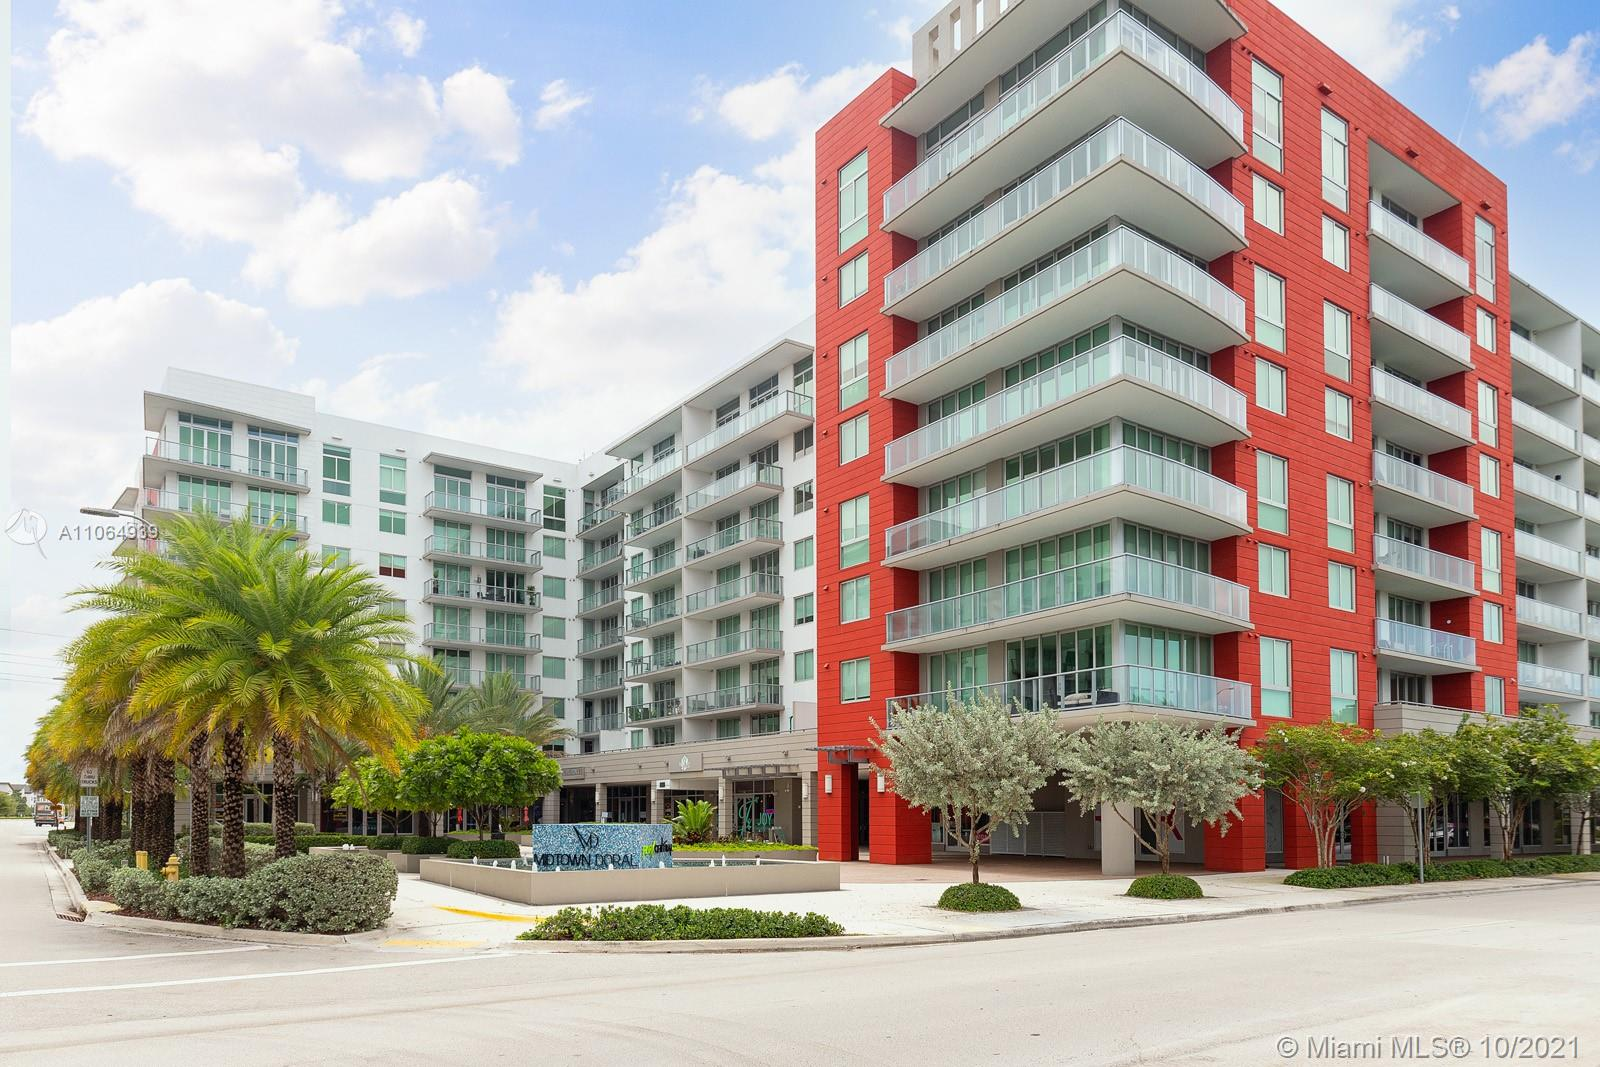 Midtown Doral - Building 1 - 7661 NW 107 Ave, Doral, FL 33178